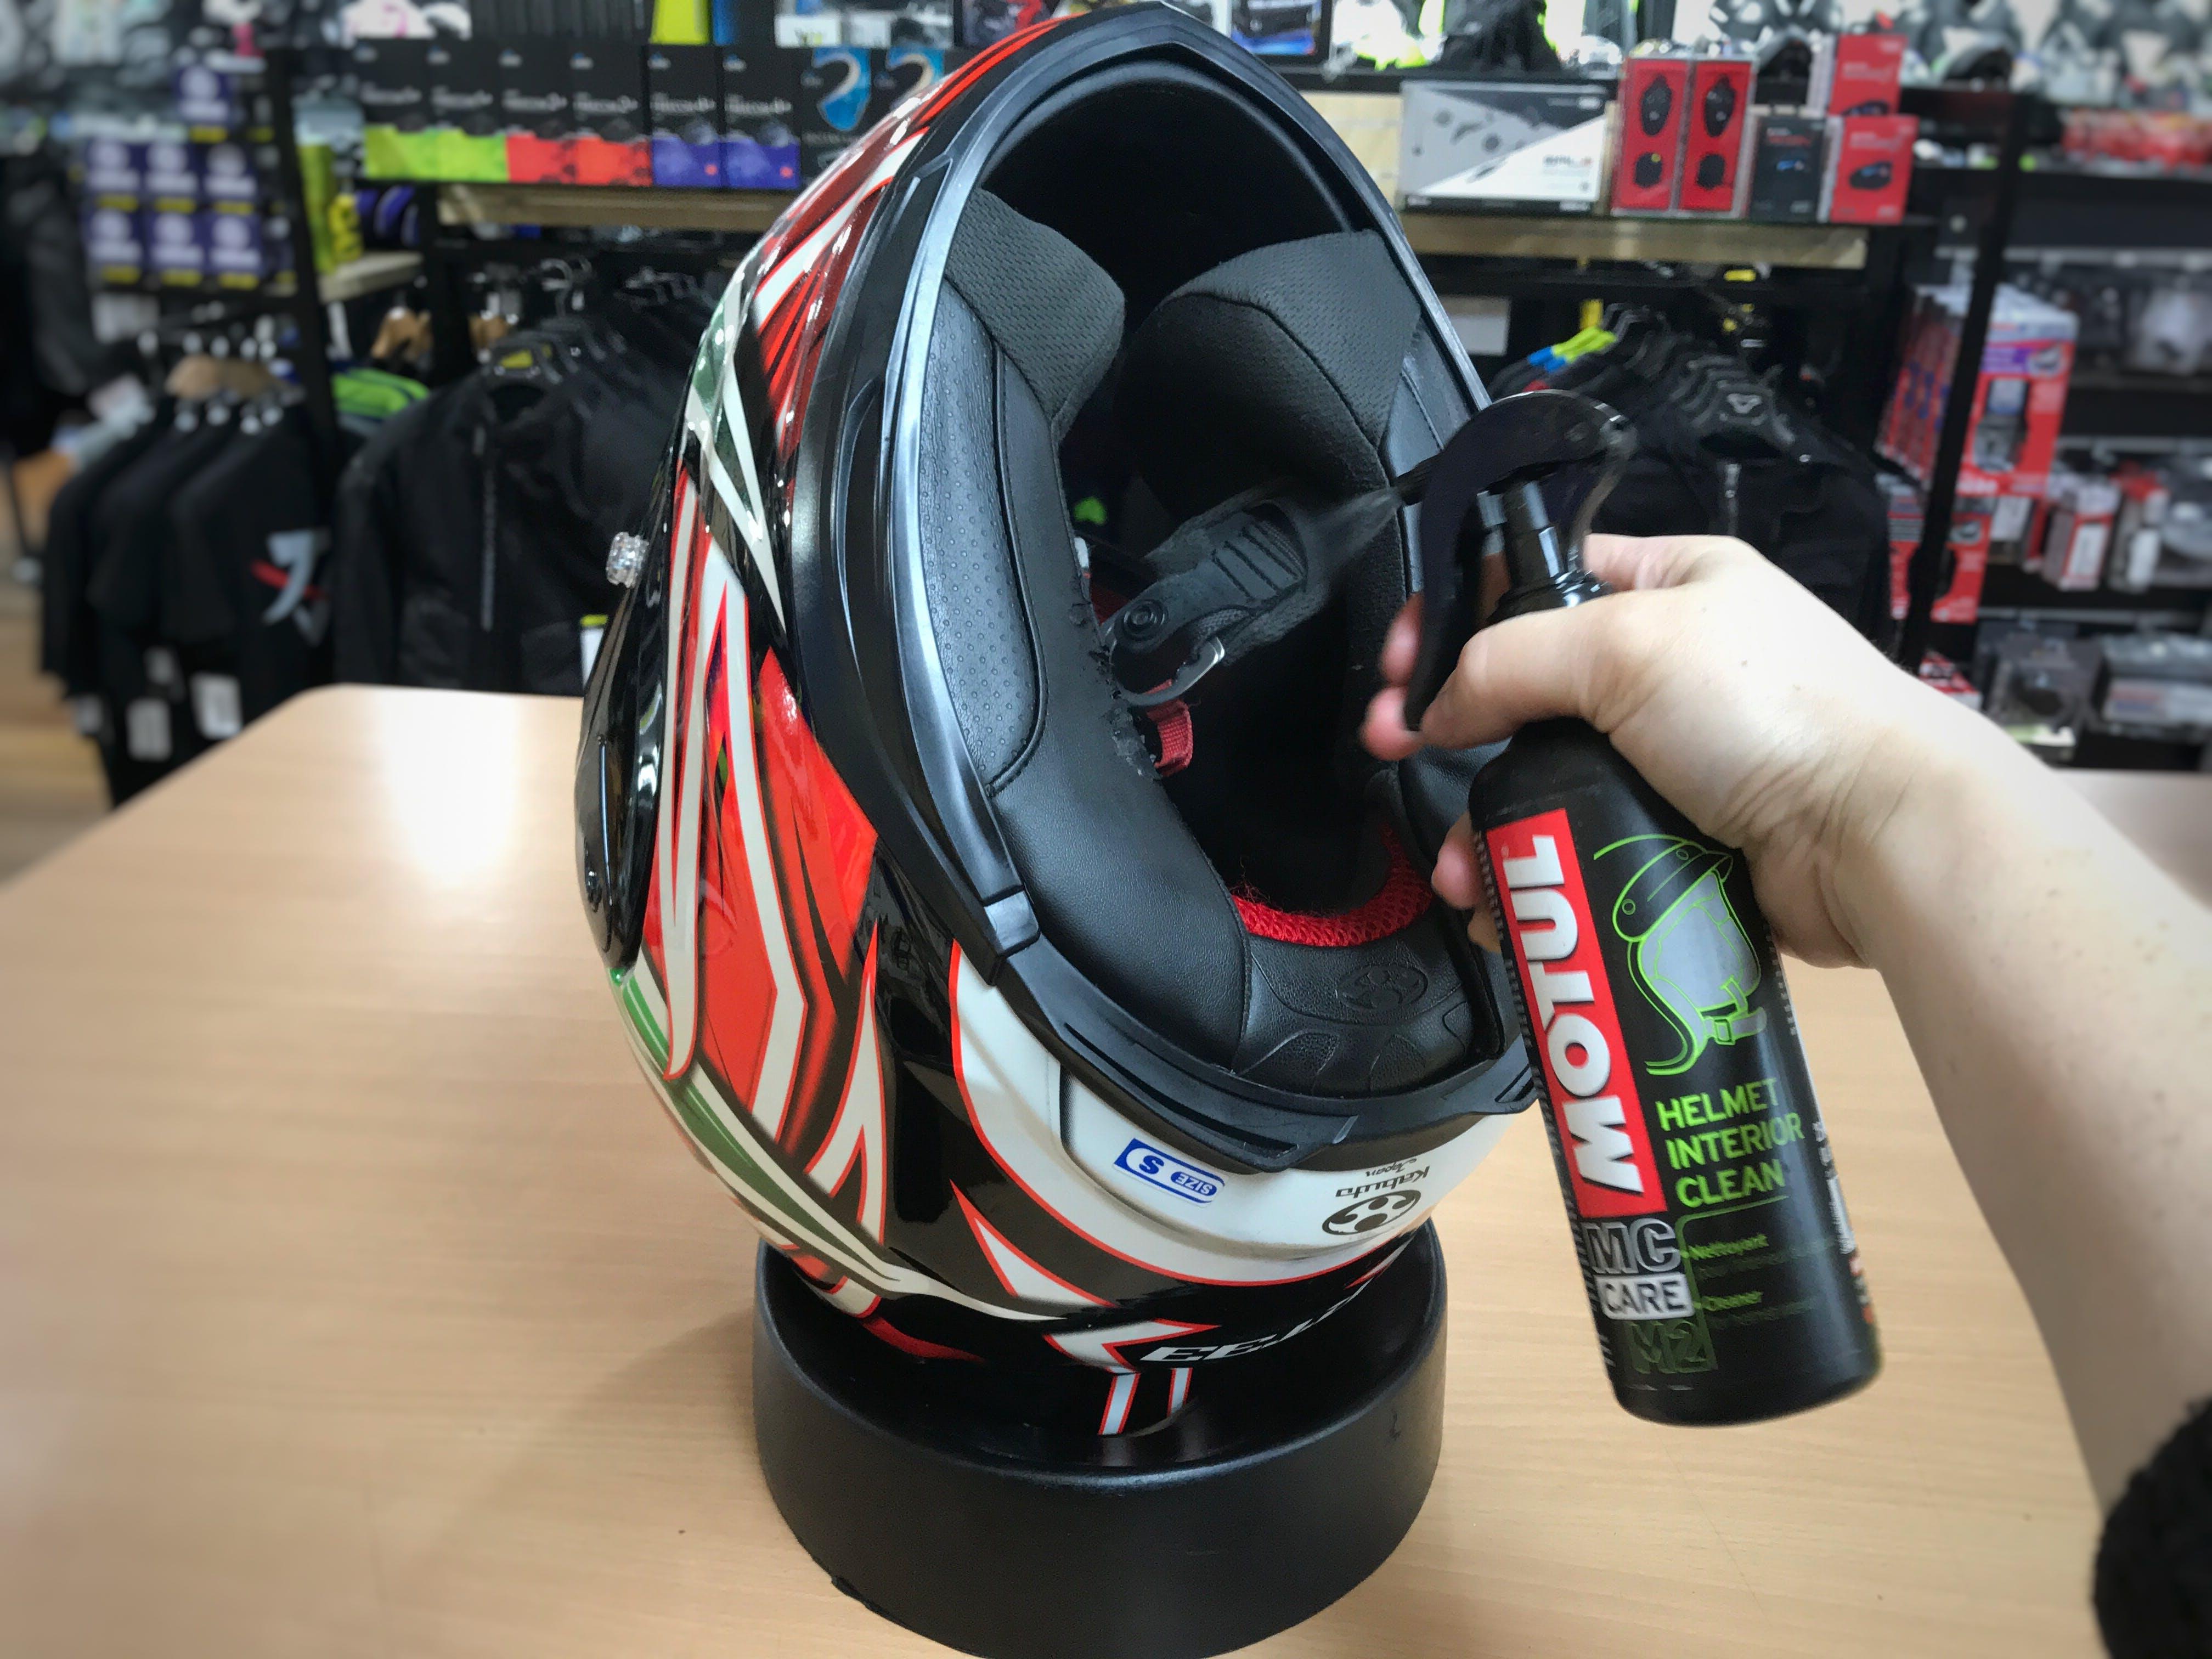 Motul Helmet Interior Clean